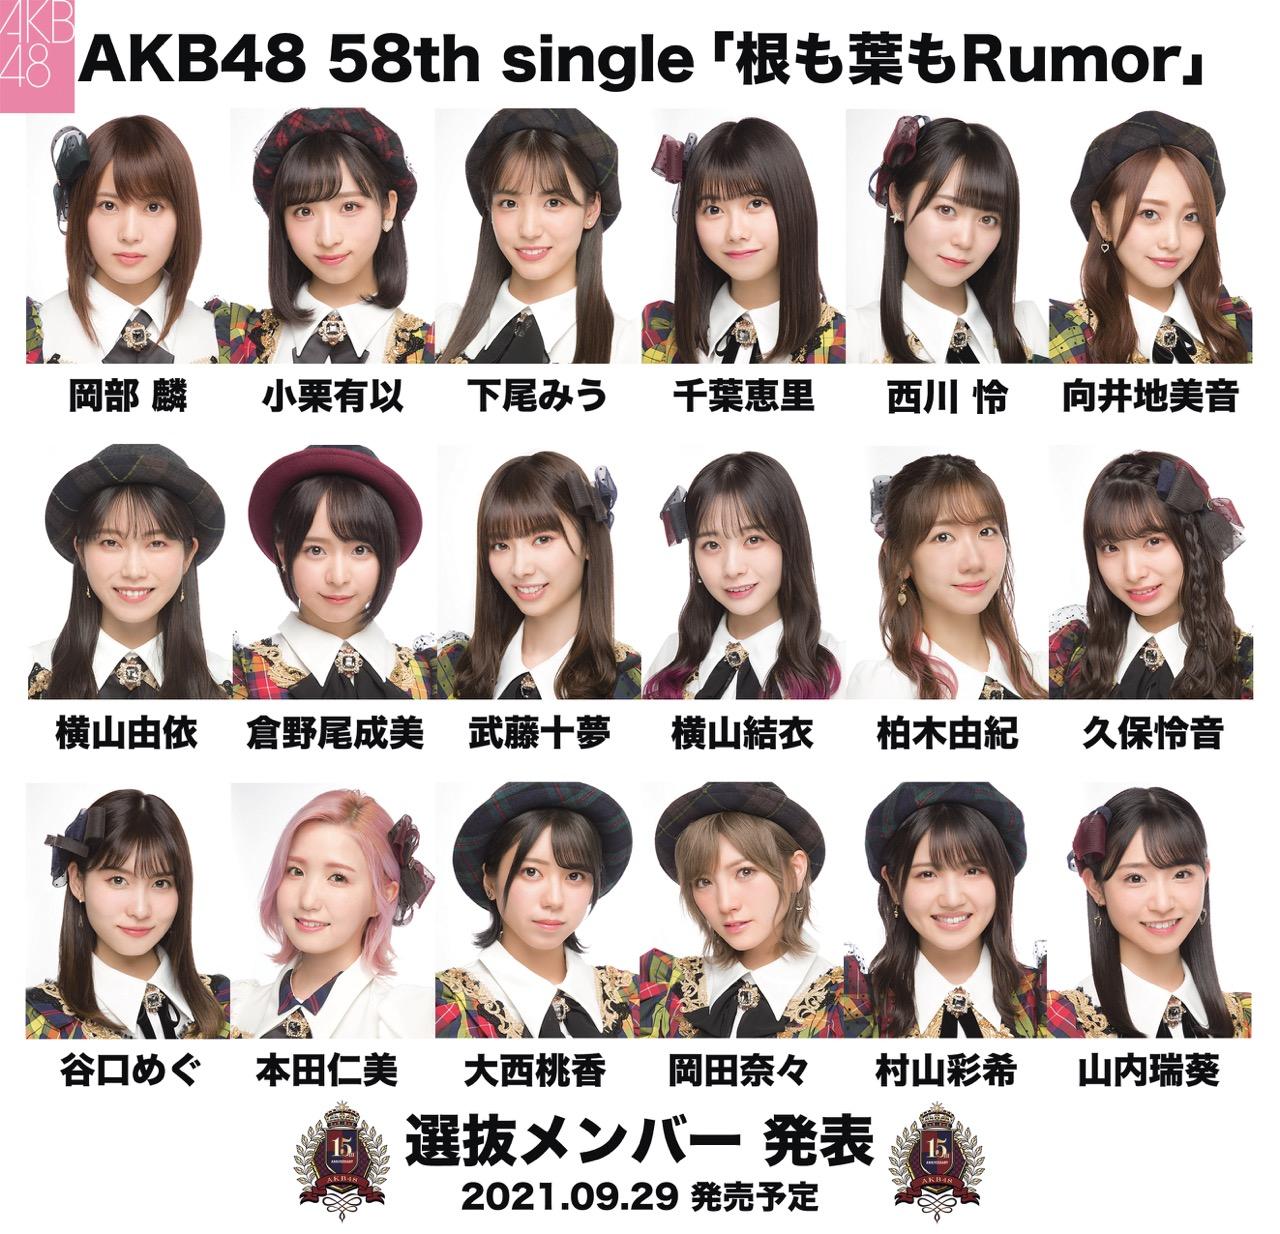 AKB48 58thシングル「根も葉もRumor」タイトル&選抜メンバー発表!9/29発売!